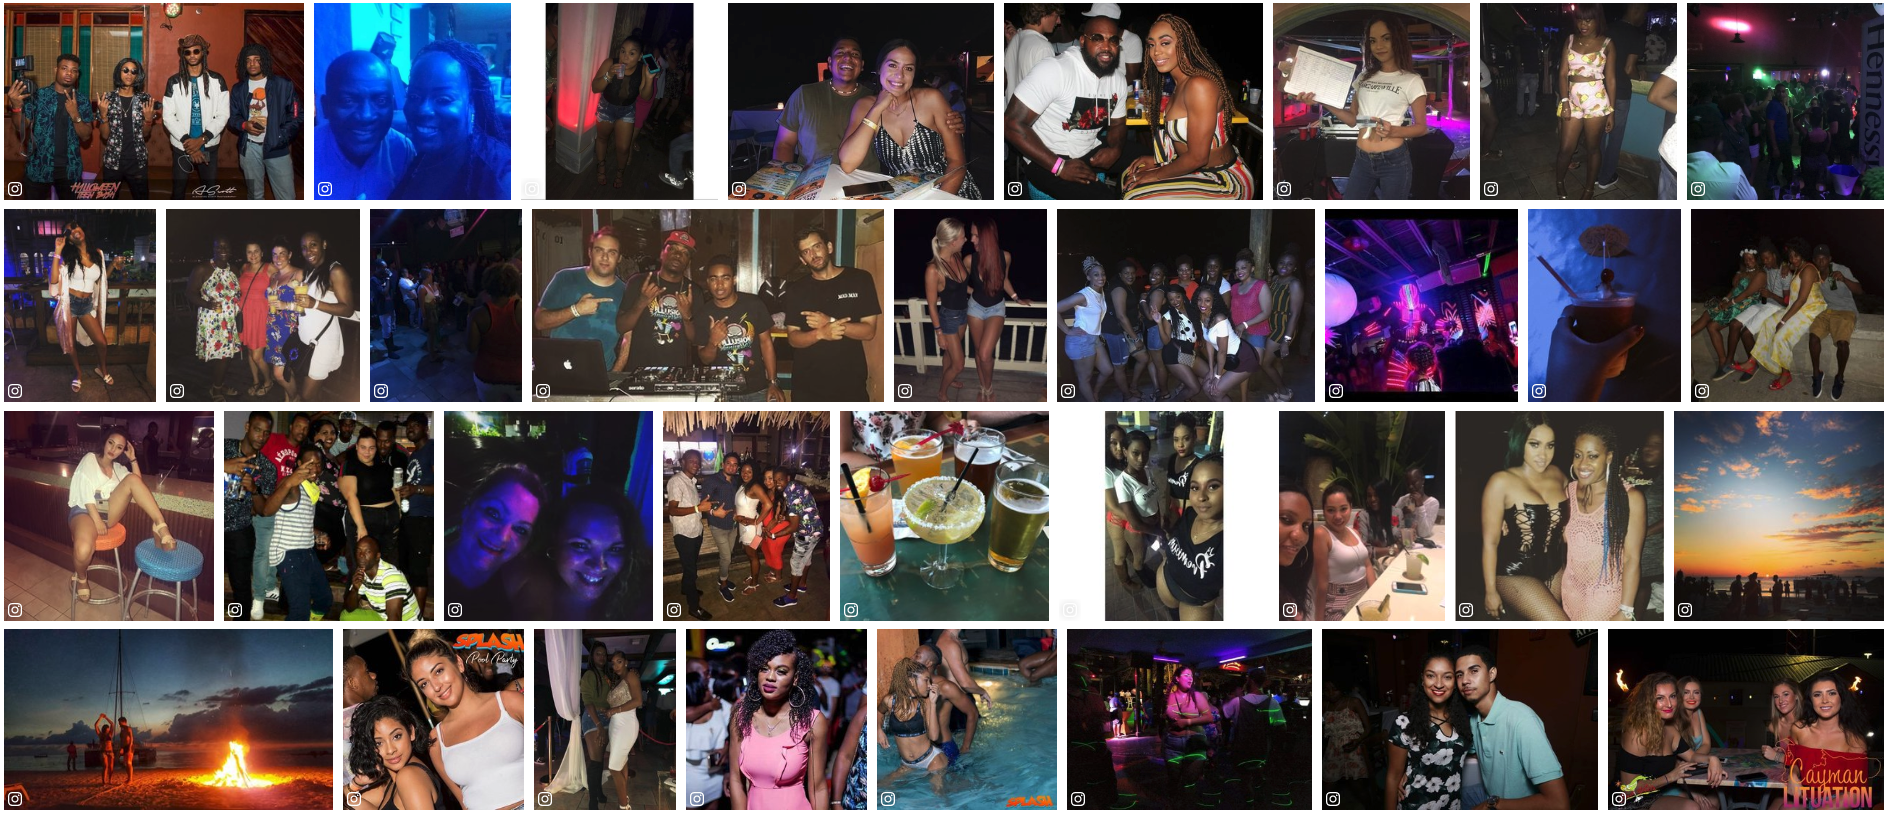 Margaritaville Caribbean Clubville image gallery